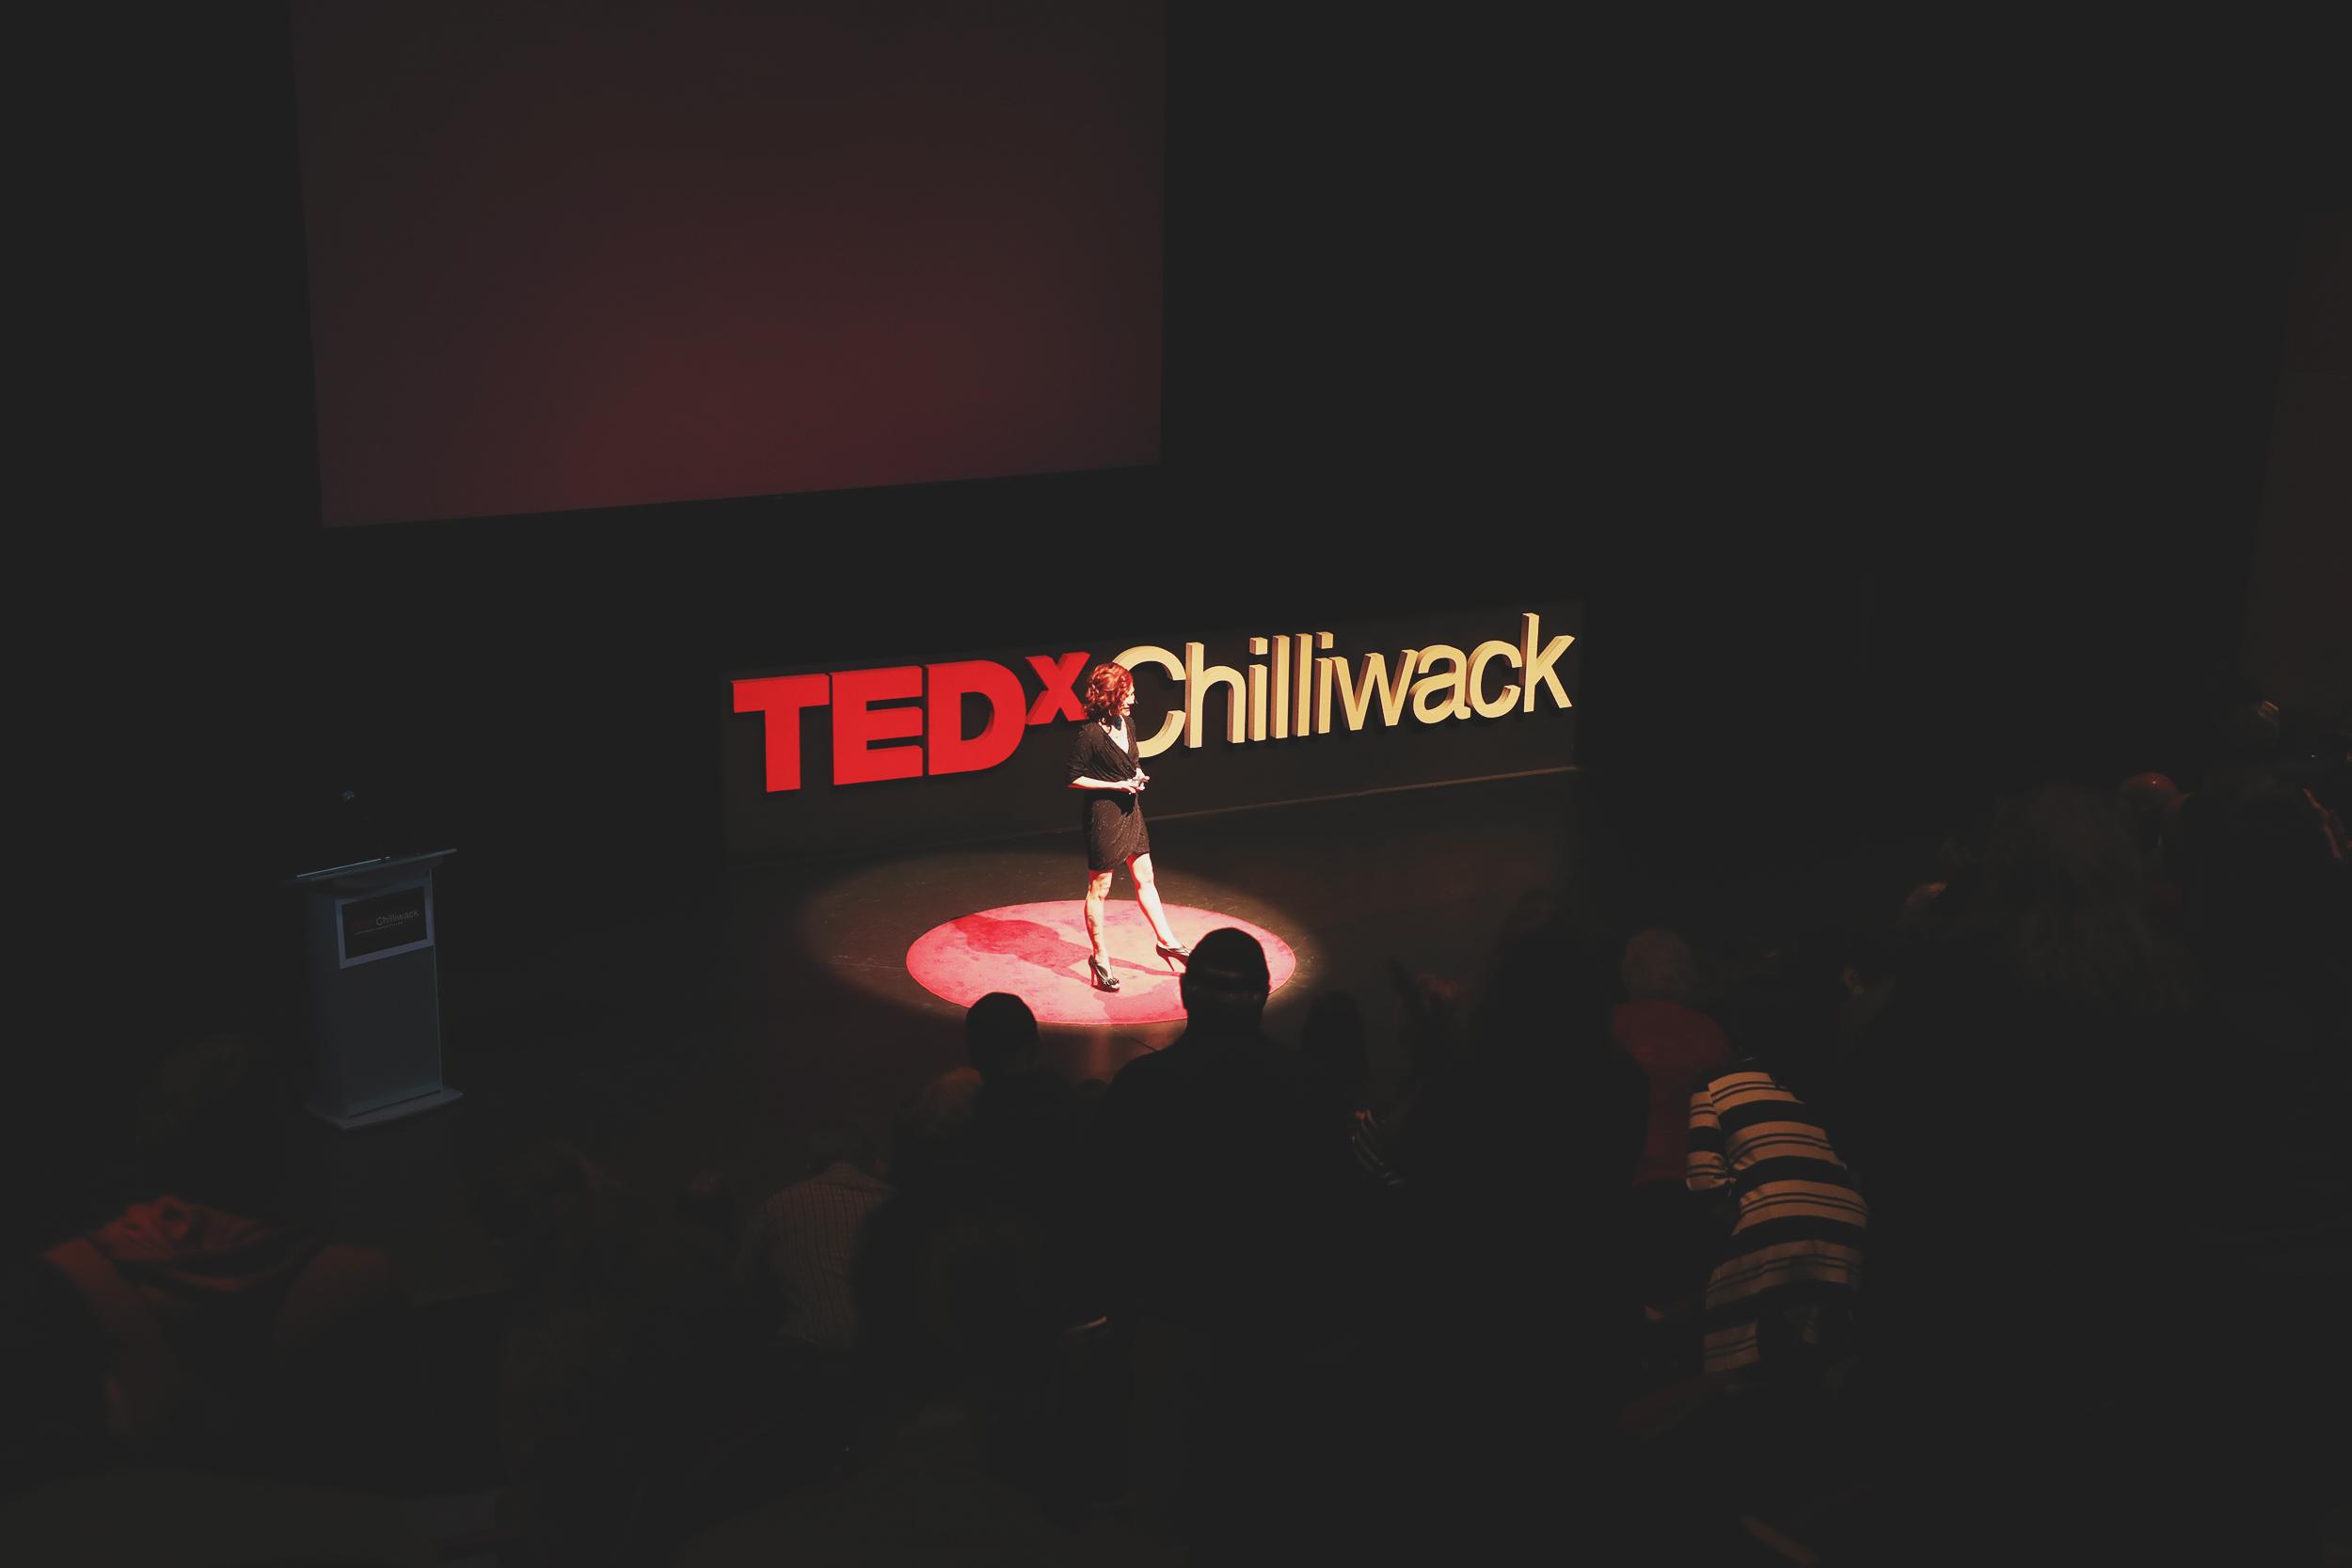 TEDX_20.jpg